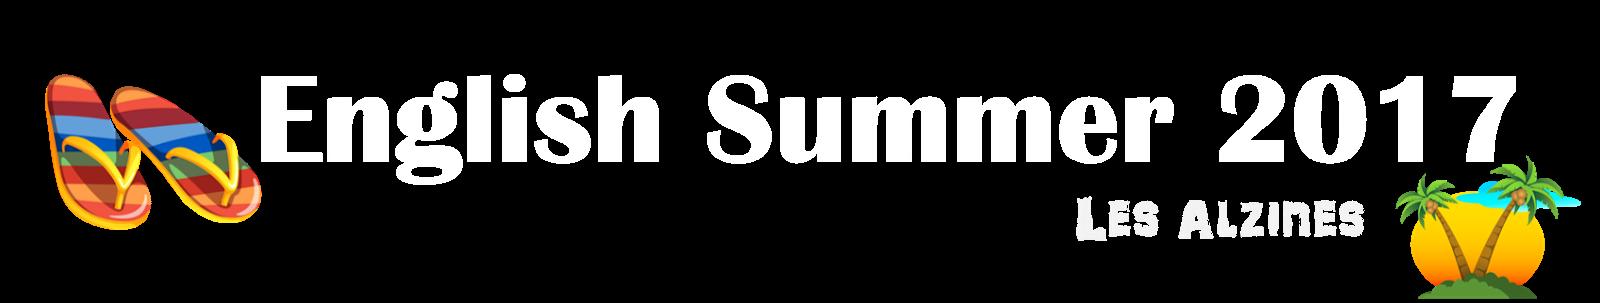 English Summer 2017